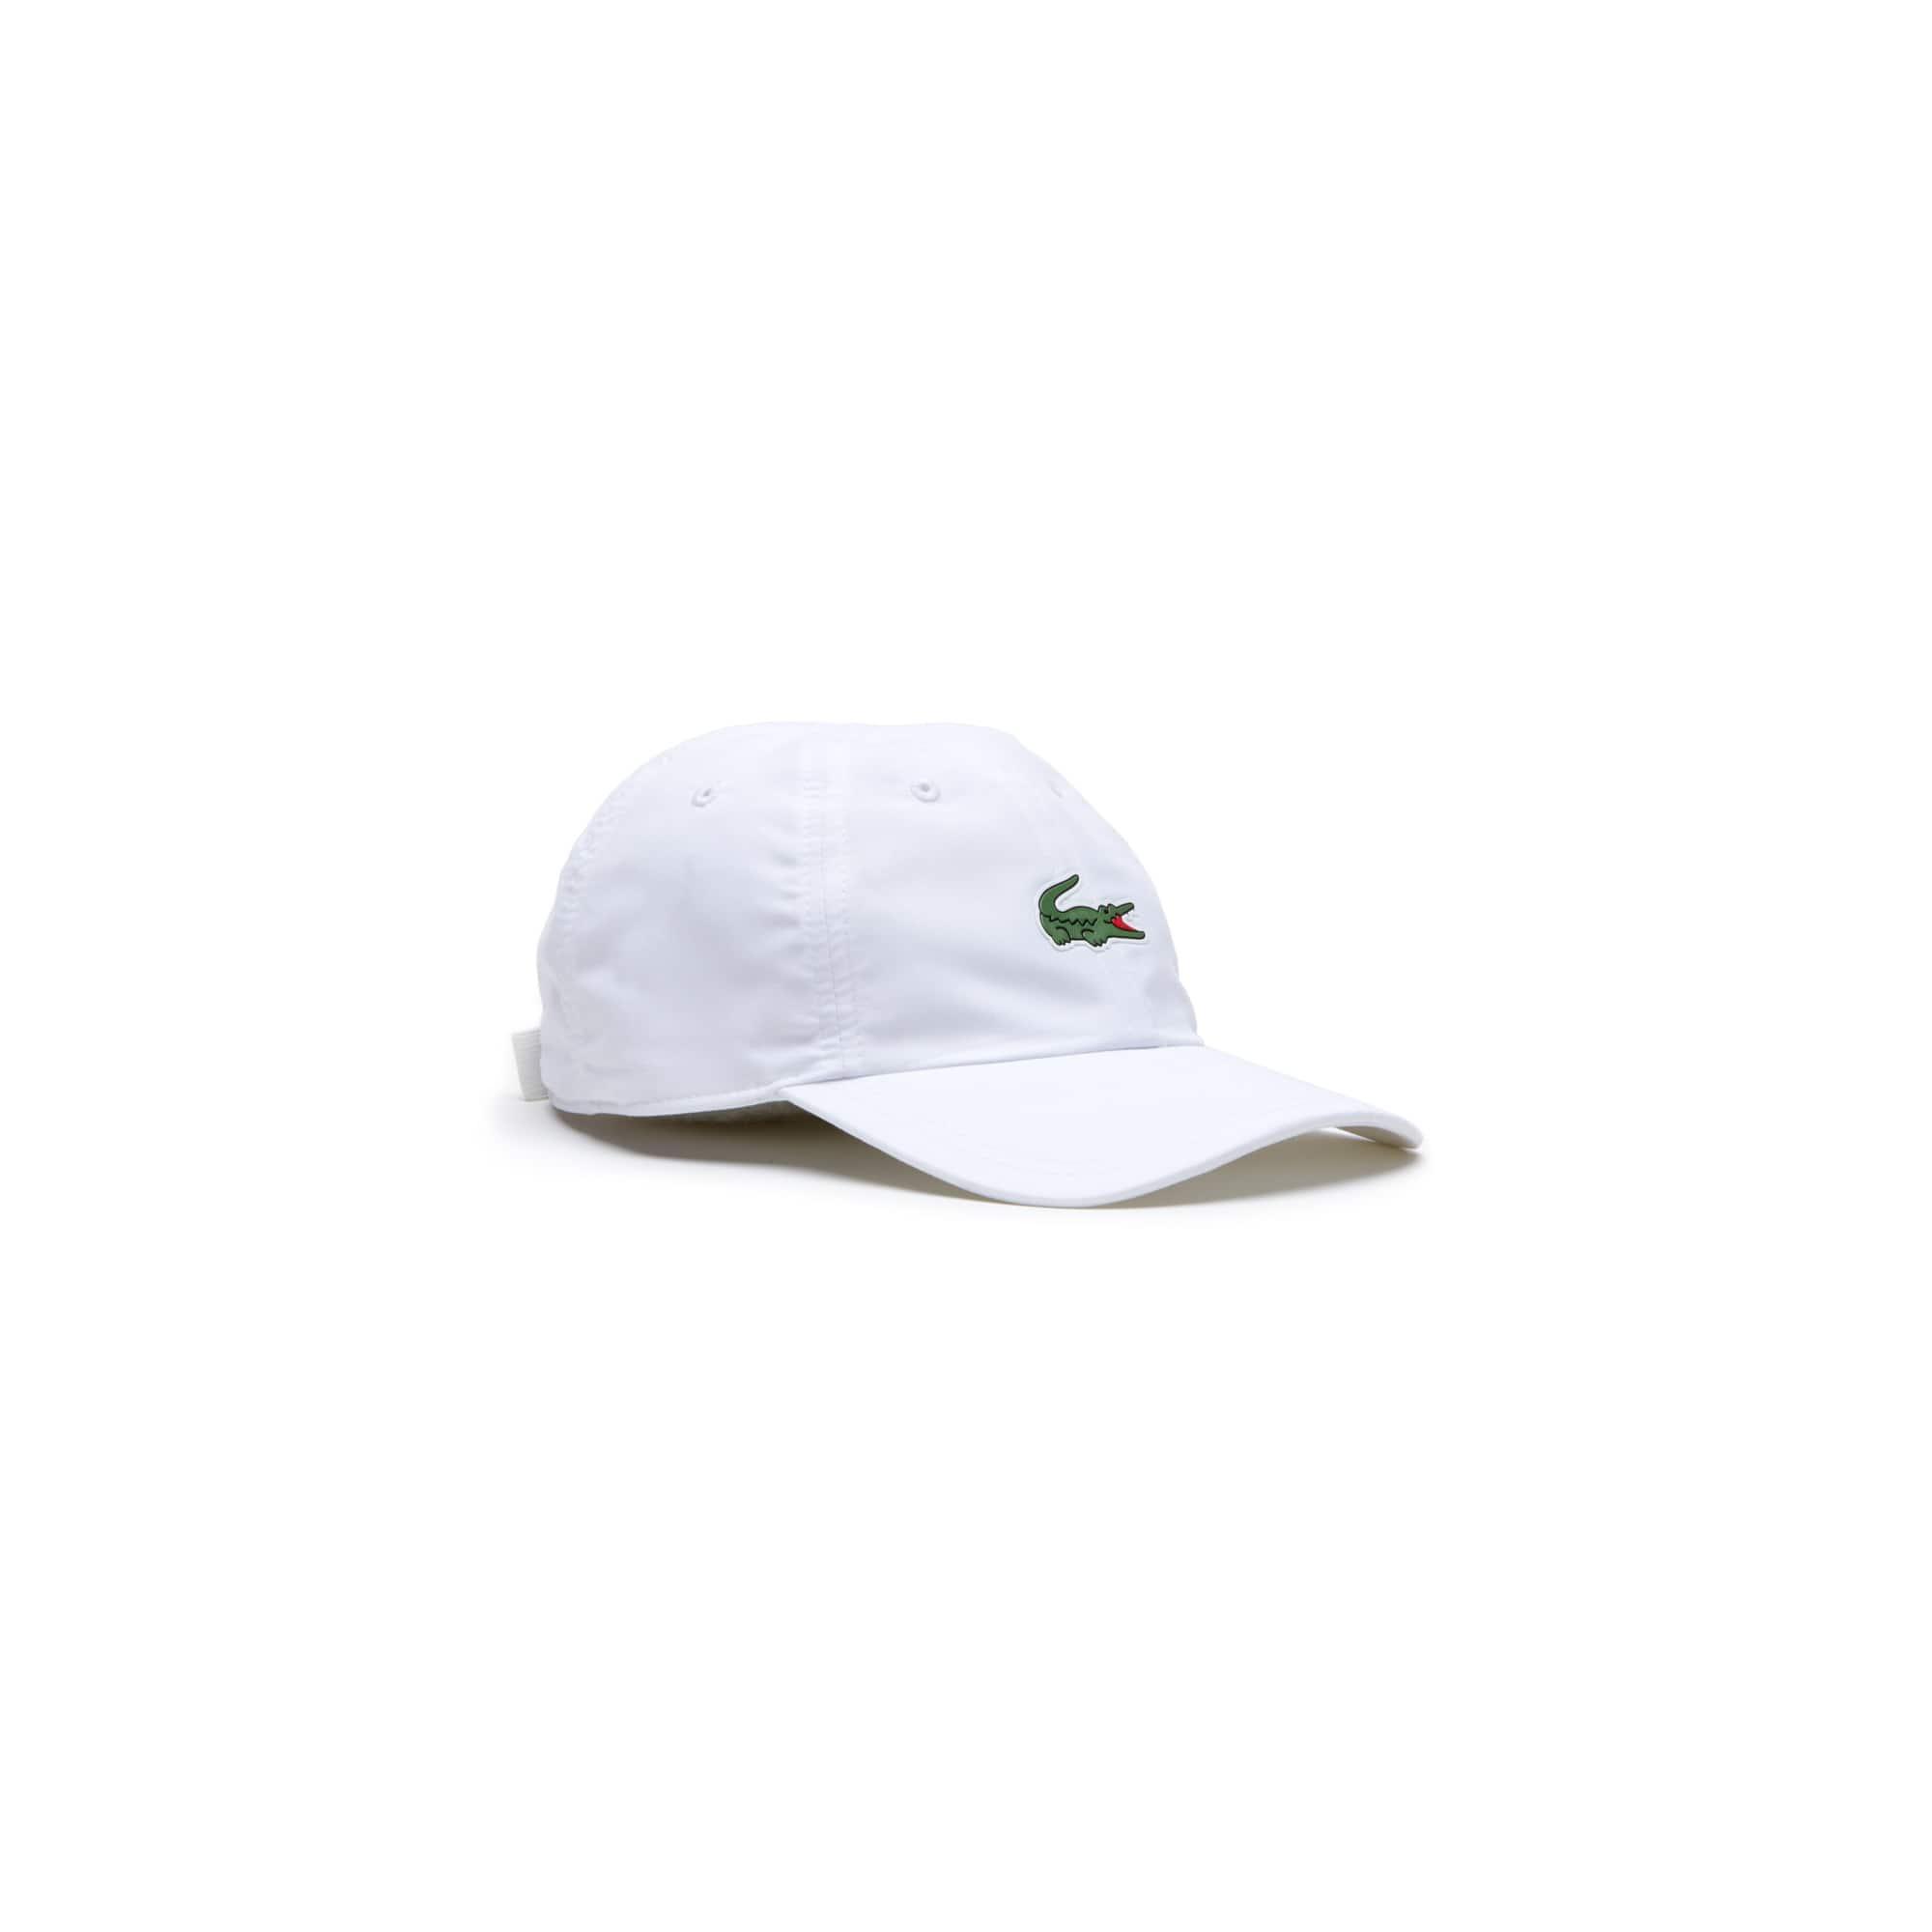 4d893061224 Men s Lacoste SPORT Tennis Microfiber Crocodile Cap